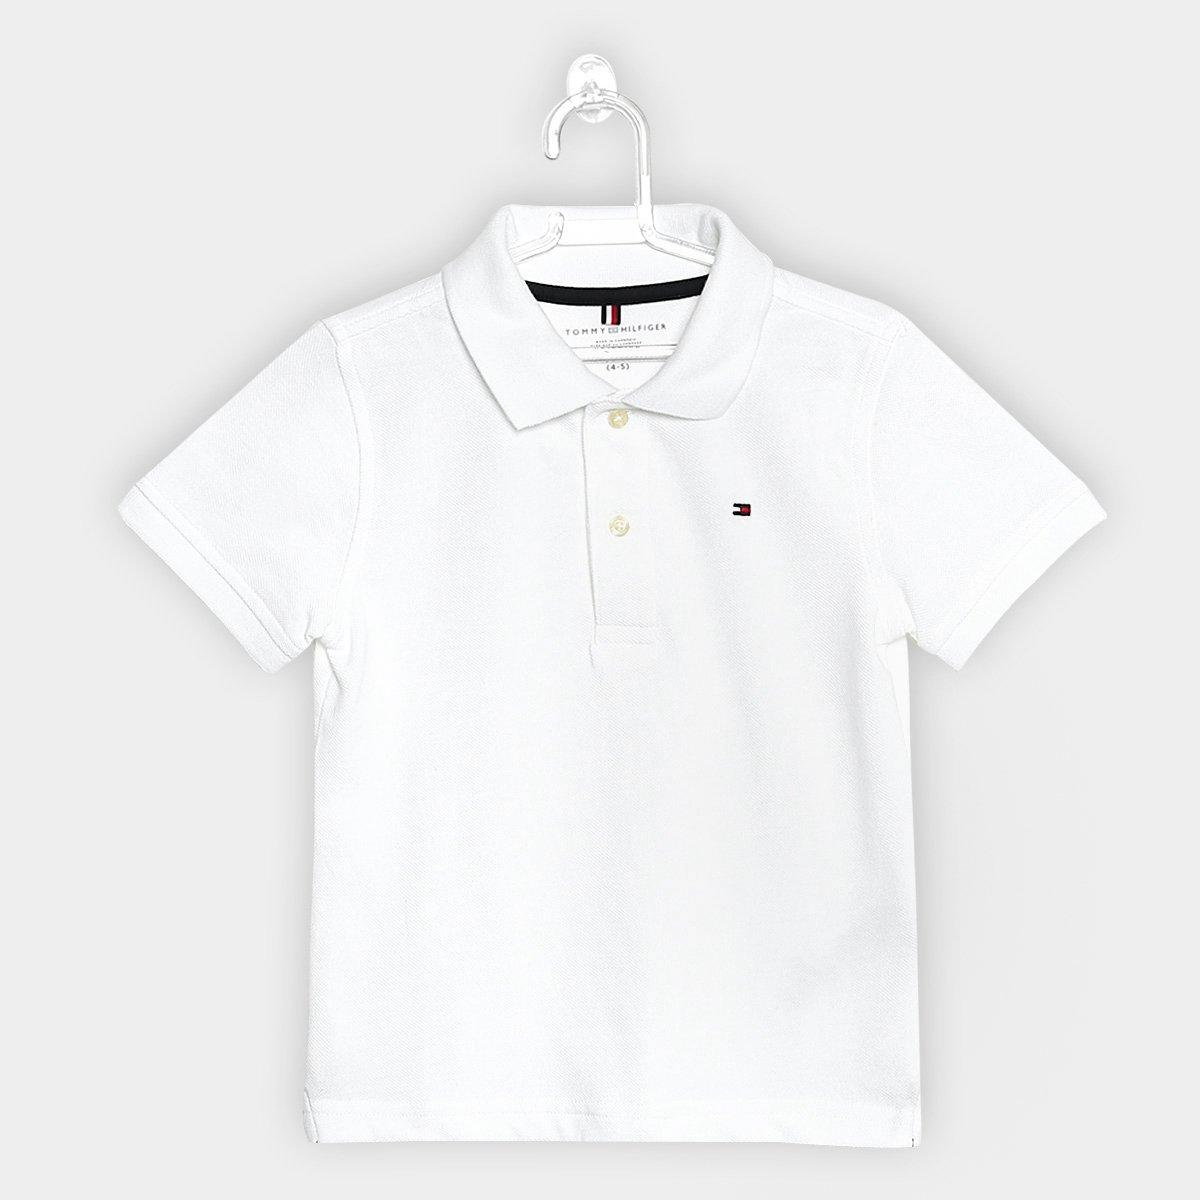 910064c44 Camisa Polo Infantil Tommy Hilfiger Masculina - Compre Agora | Netshoes